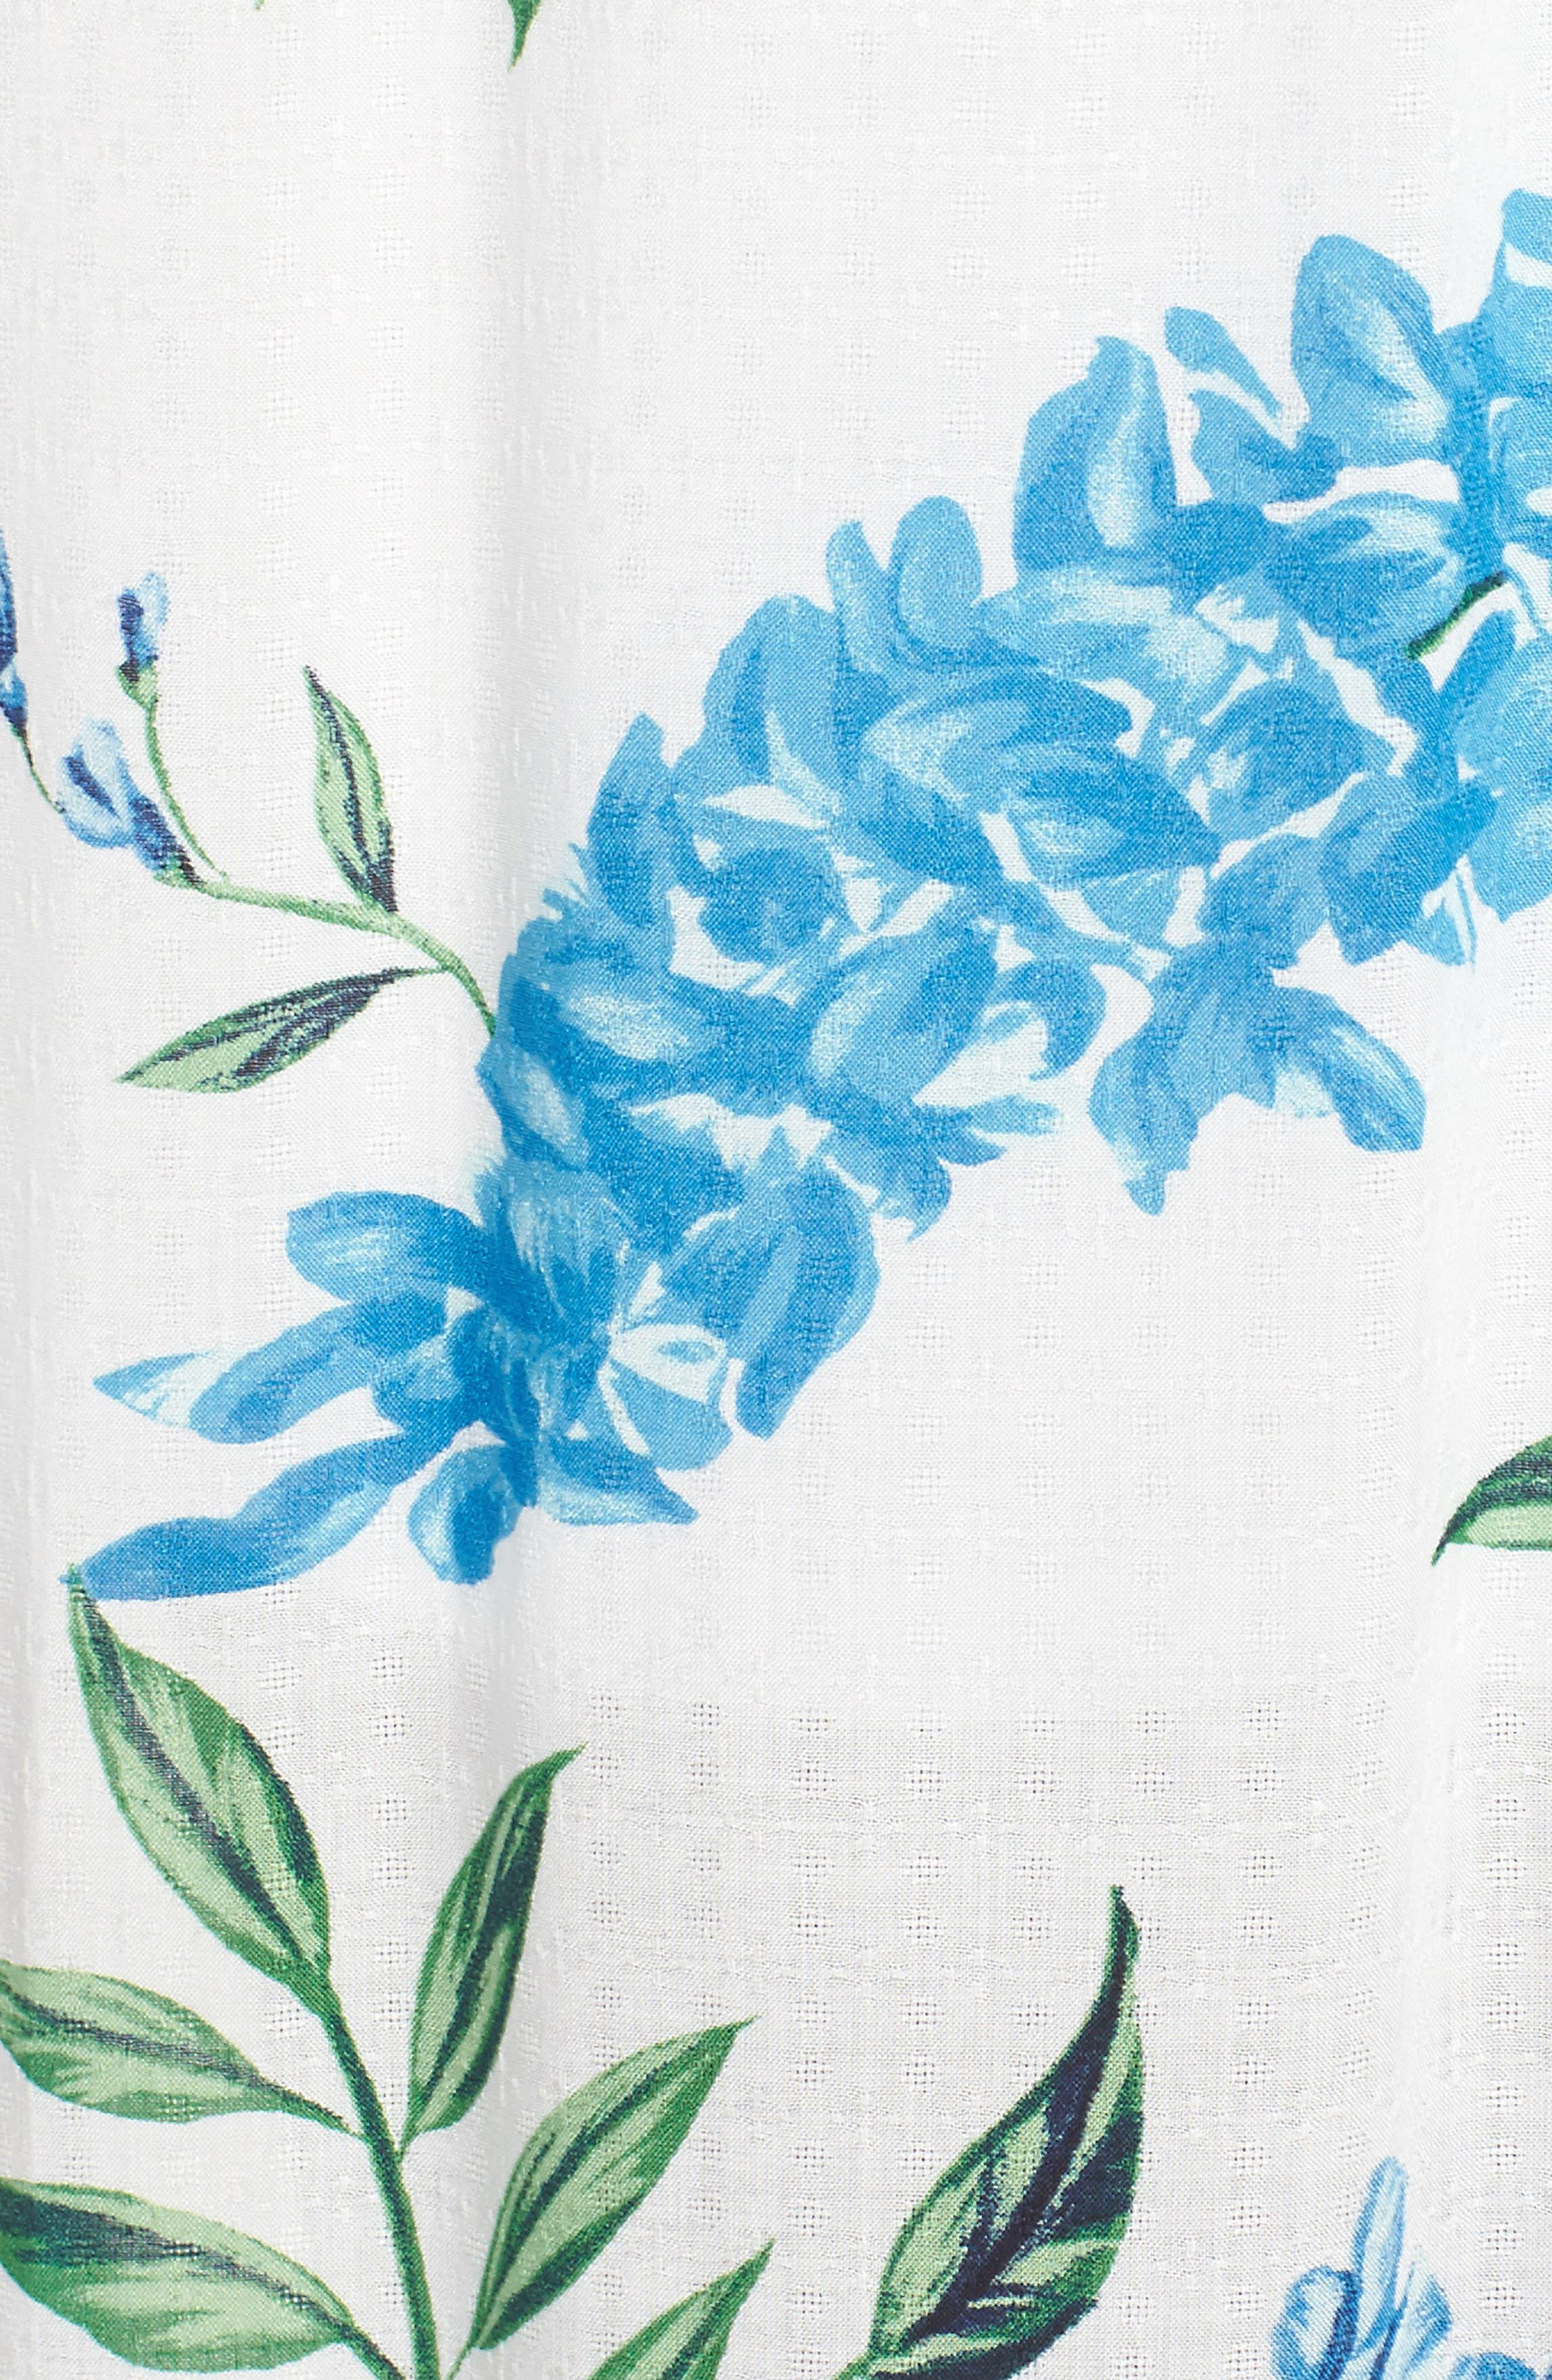 Nicola Ruffle Maxi Dress,                             Alternate thumbnail 5, color,                             Wisteria Wonder Challis